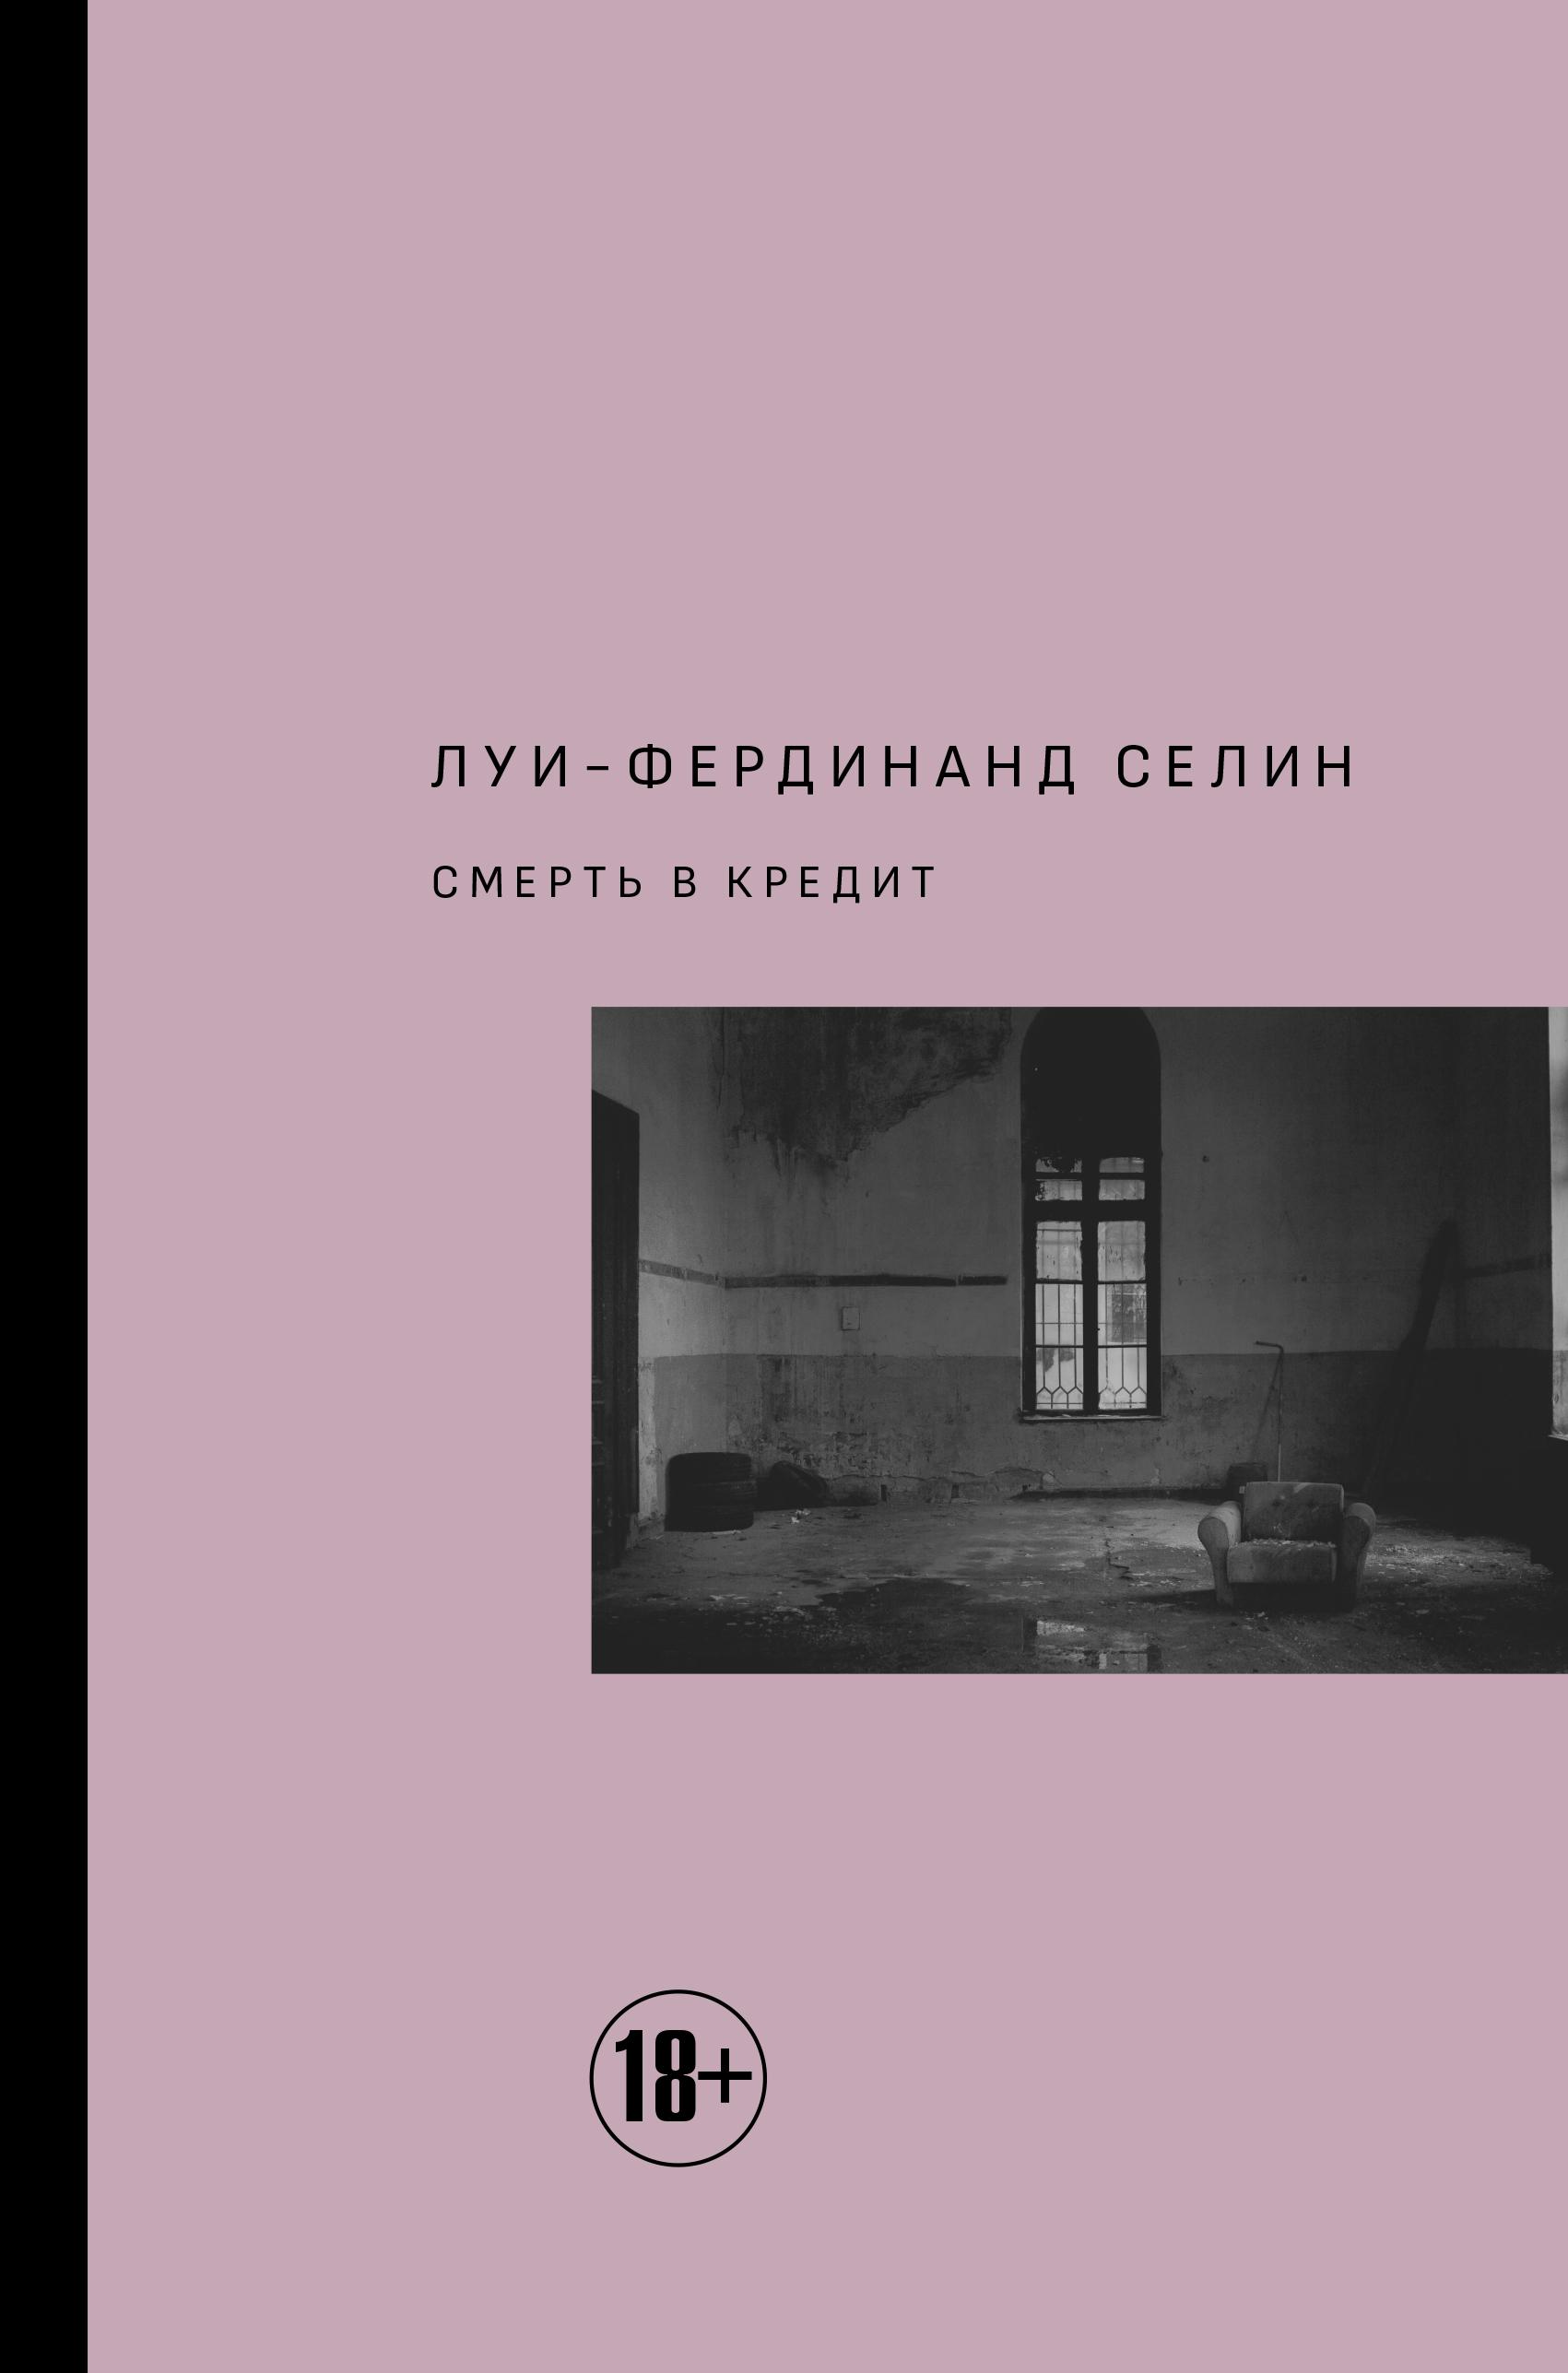 Луи-Фердинанд Селин Смерть в кредит